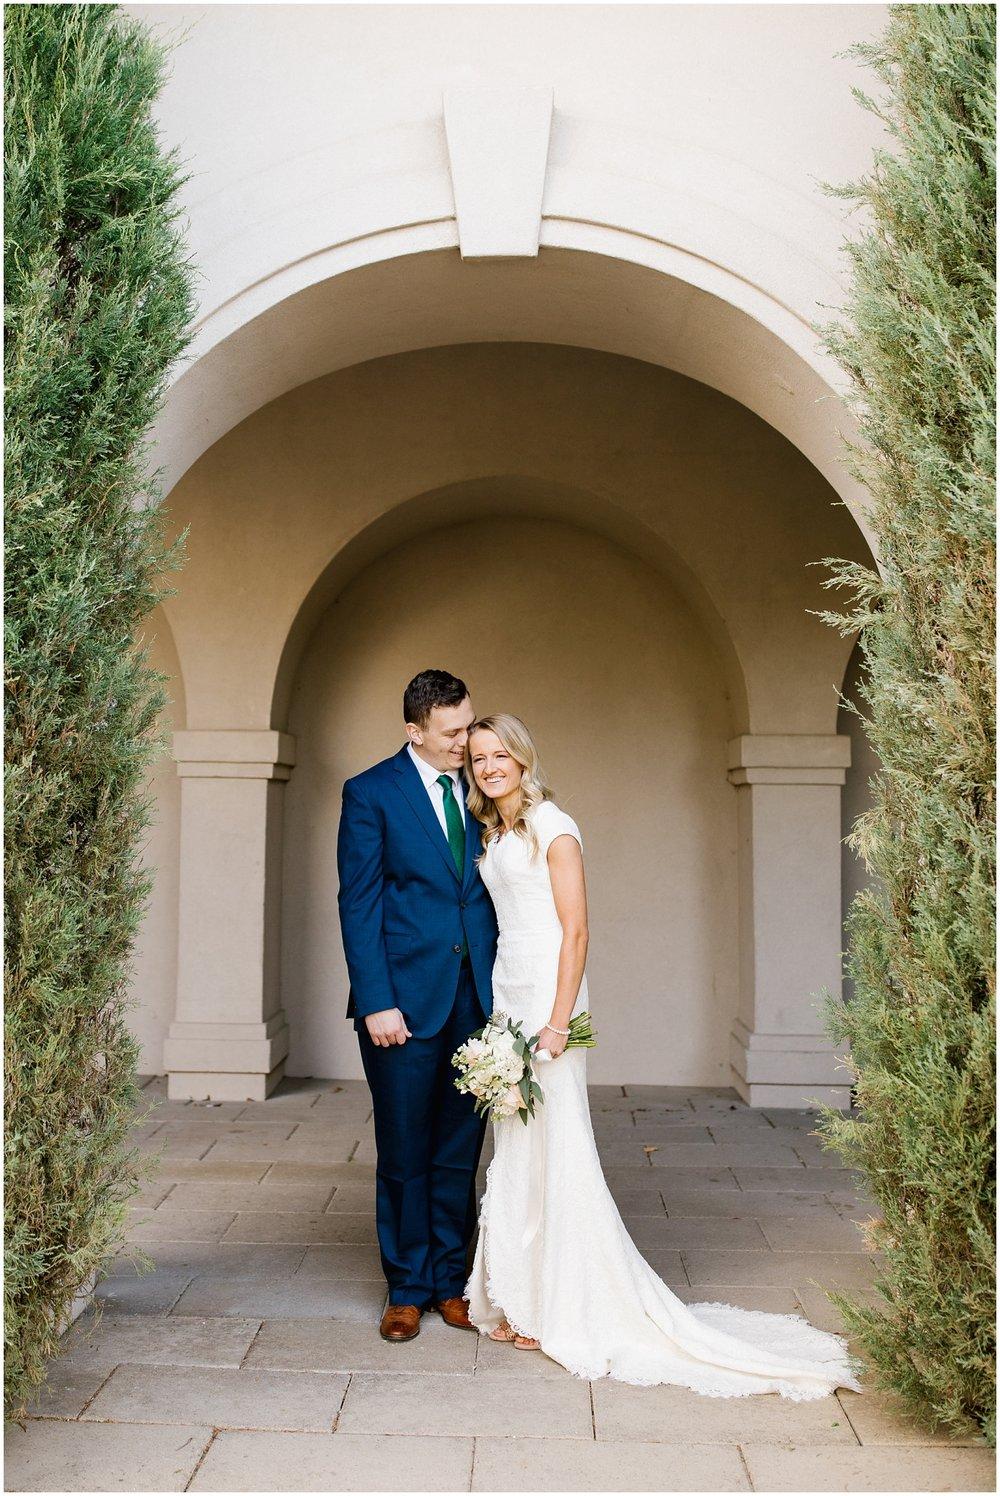 TA-Bridals-18_Lizzie-B-Imagery-Utah-Wedding-Photographer-Park-City-Salt-Lake-City-Thanksgiving-Point-Ashton-Gardens-Lehi-Utah.jpg